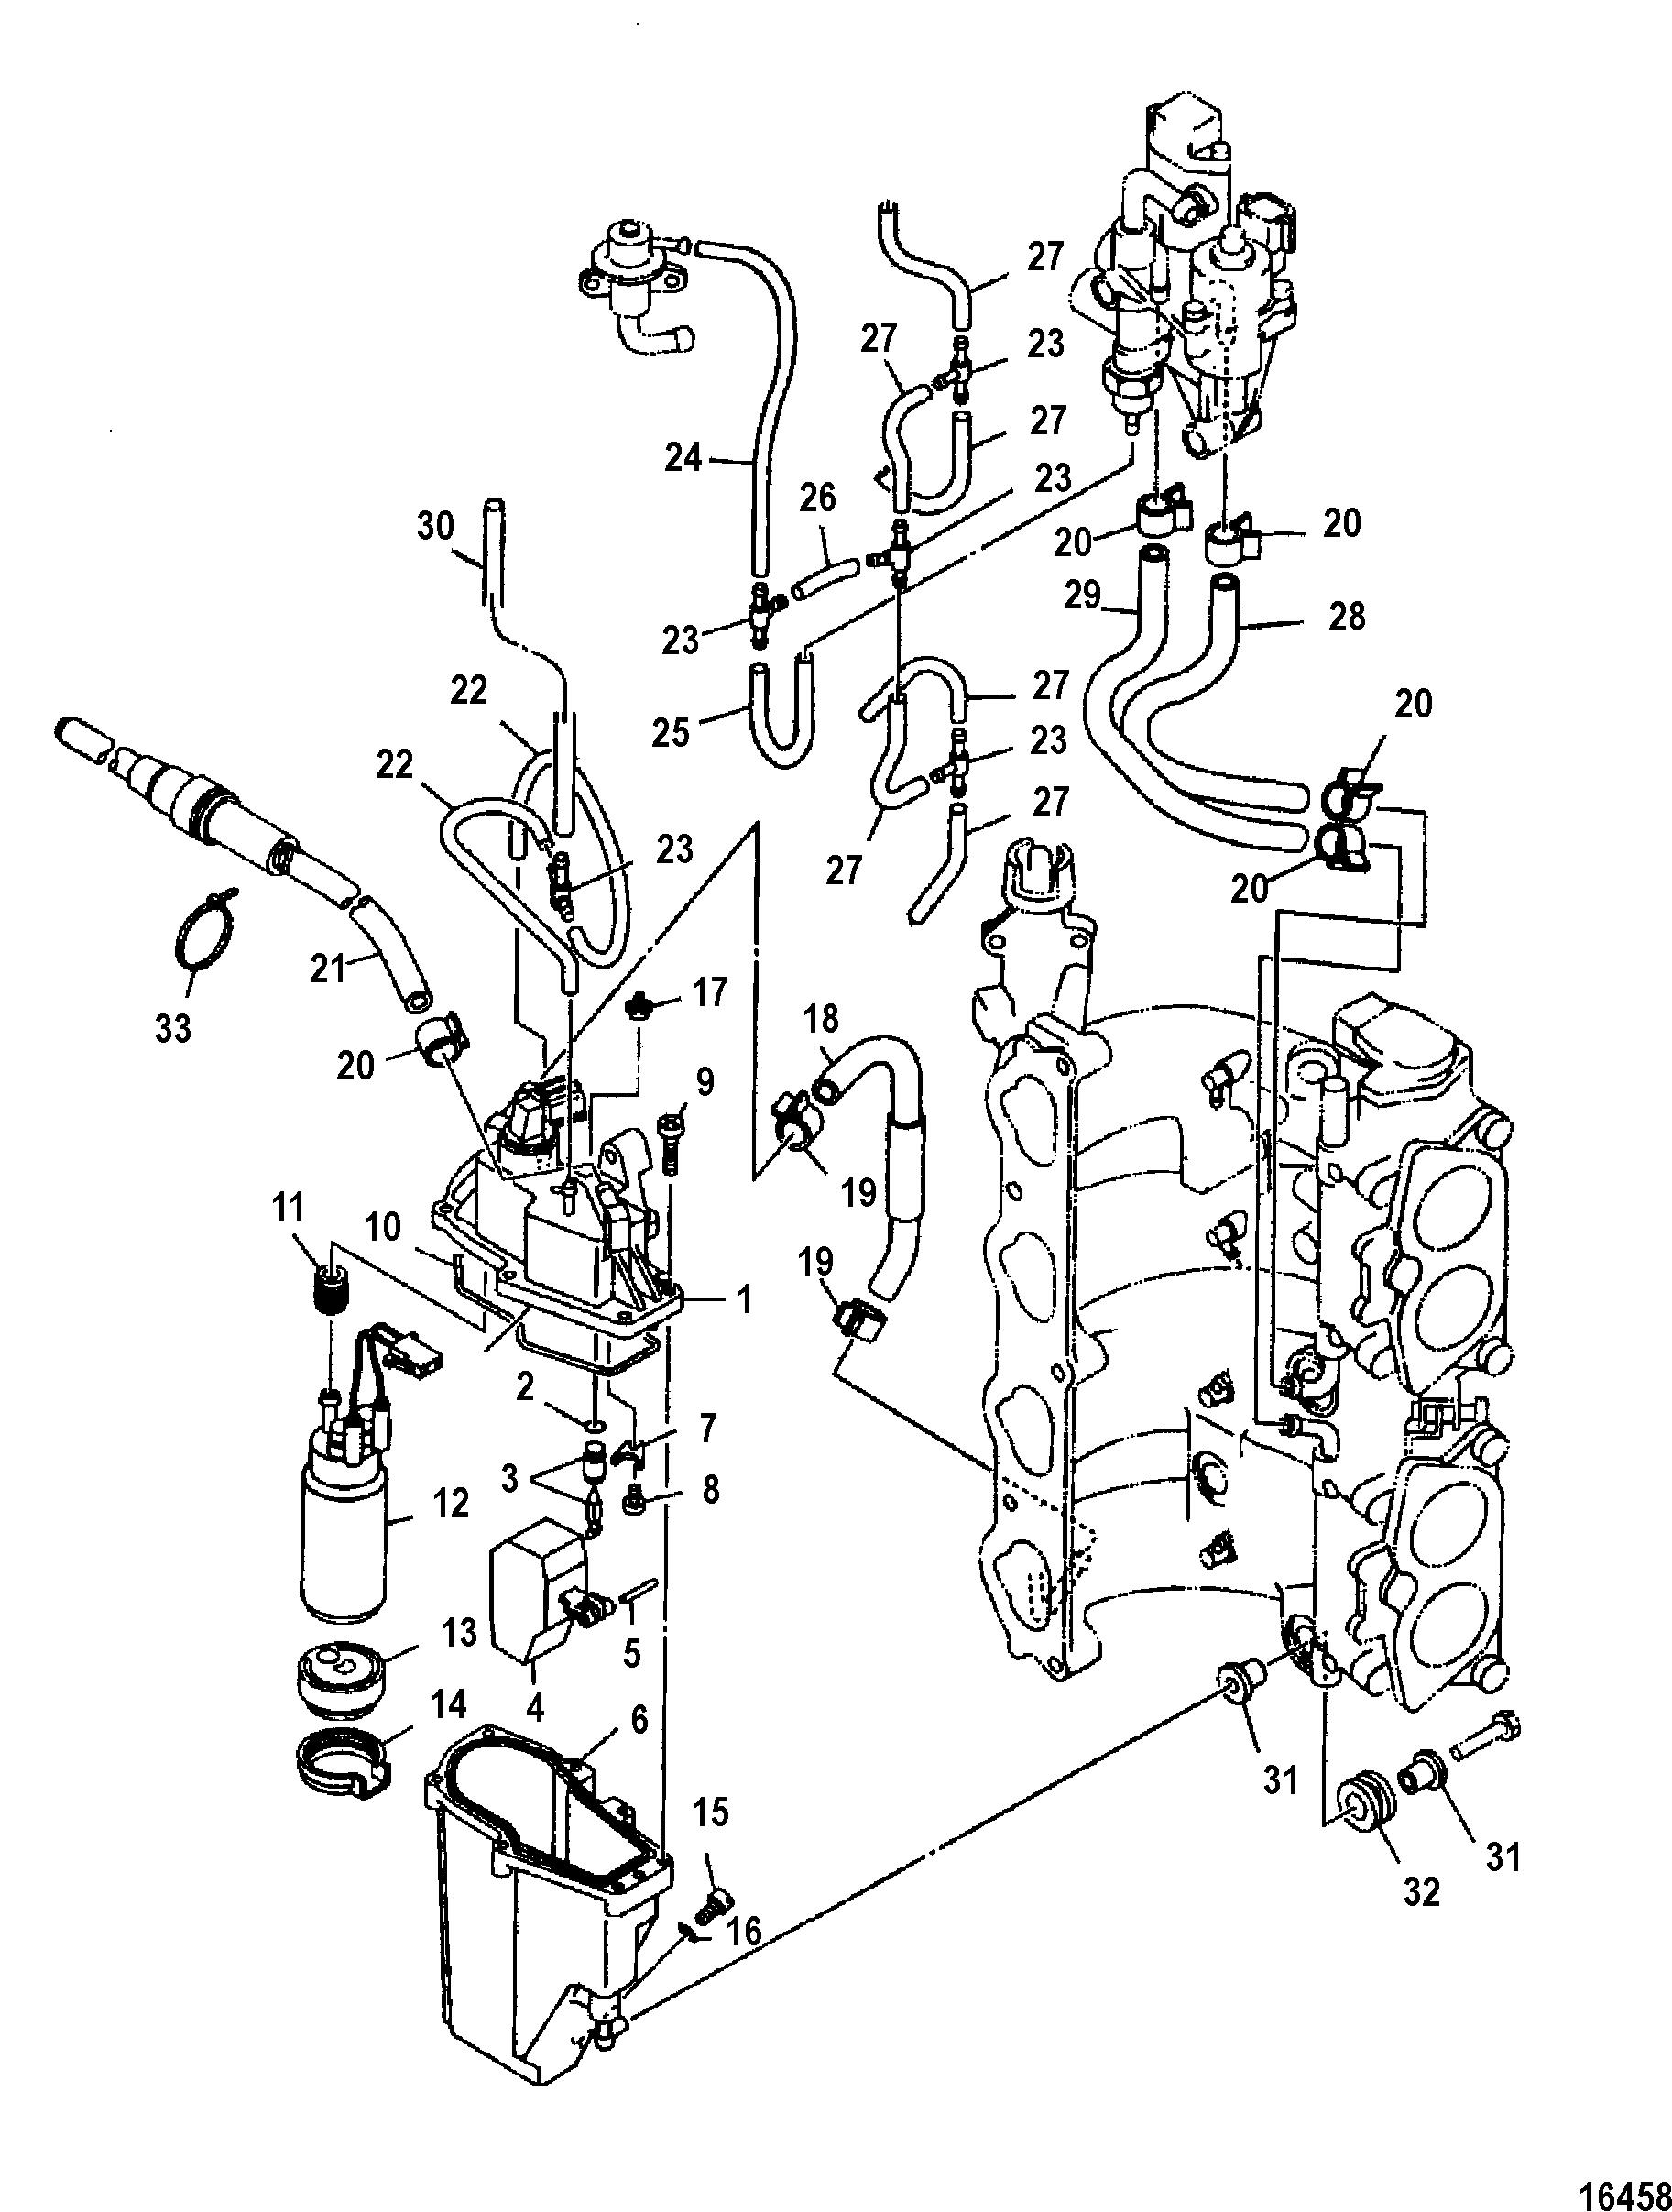 Boat Wiring Diagrams Manuals